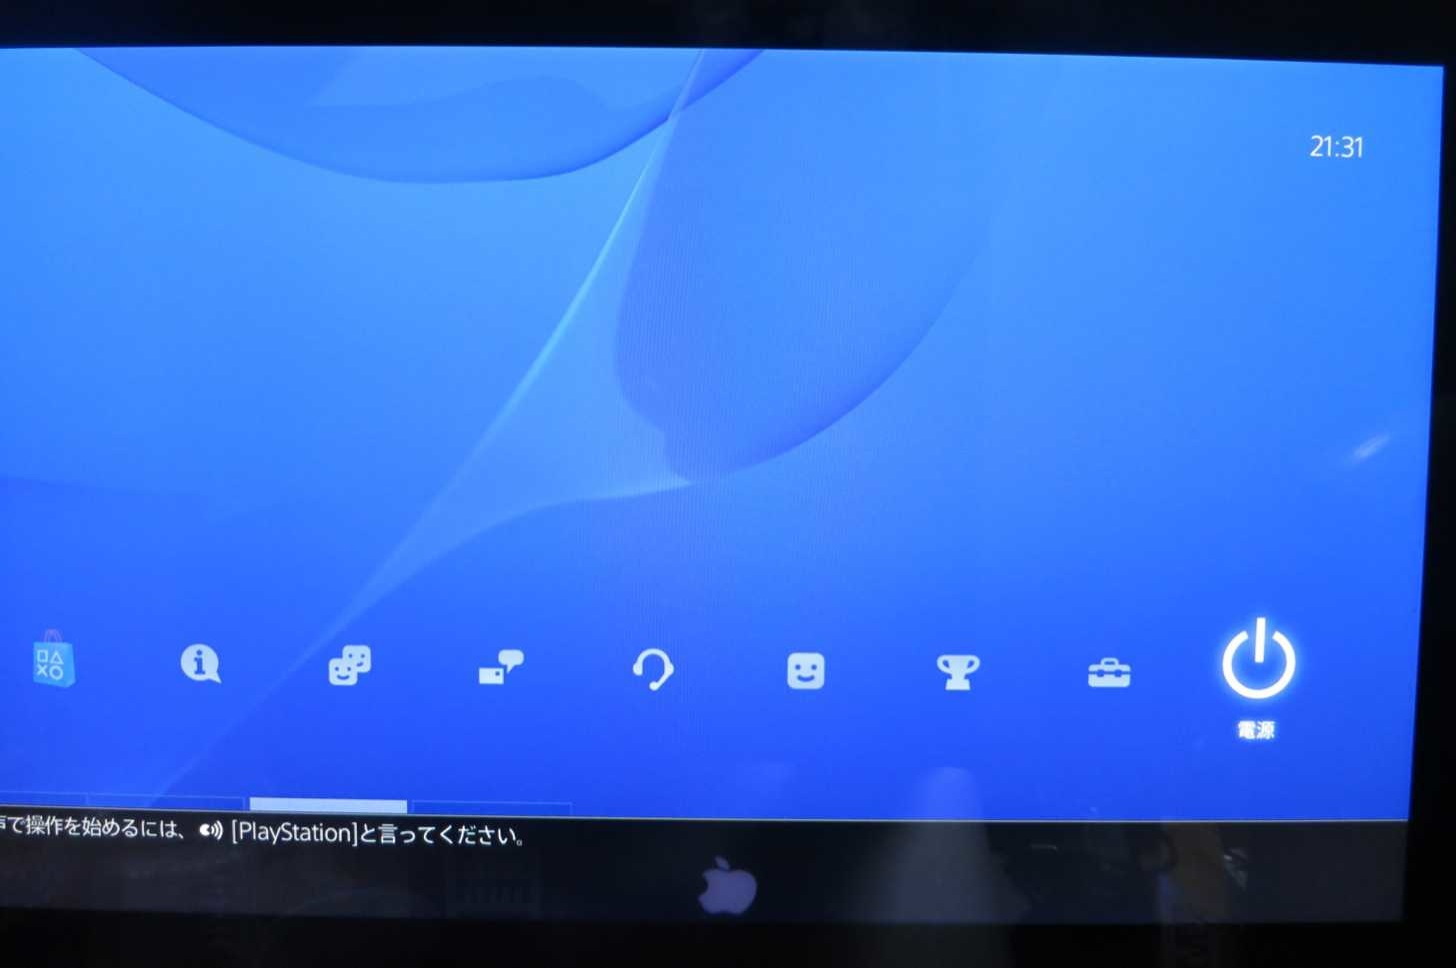 PS4の機能画面